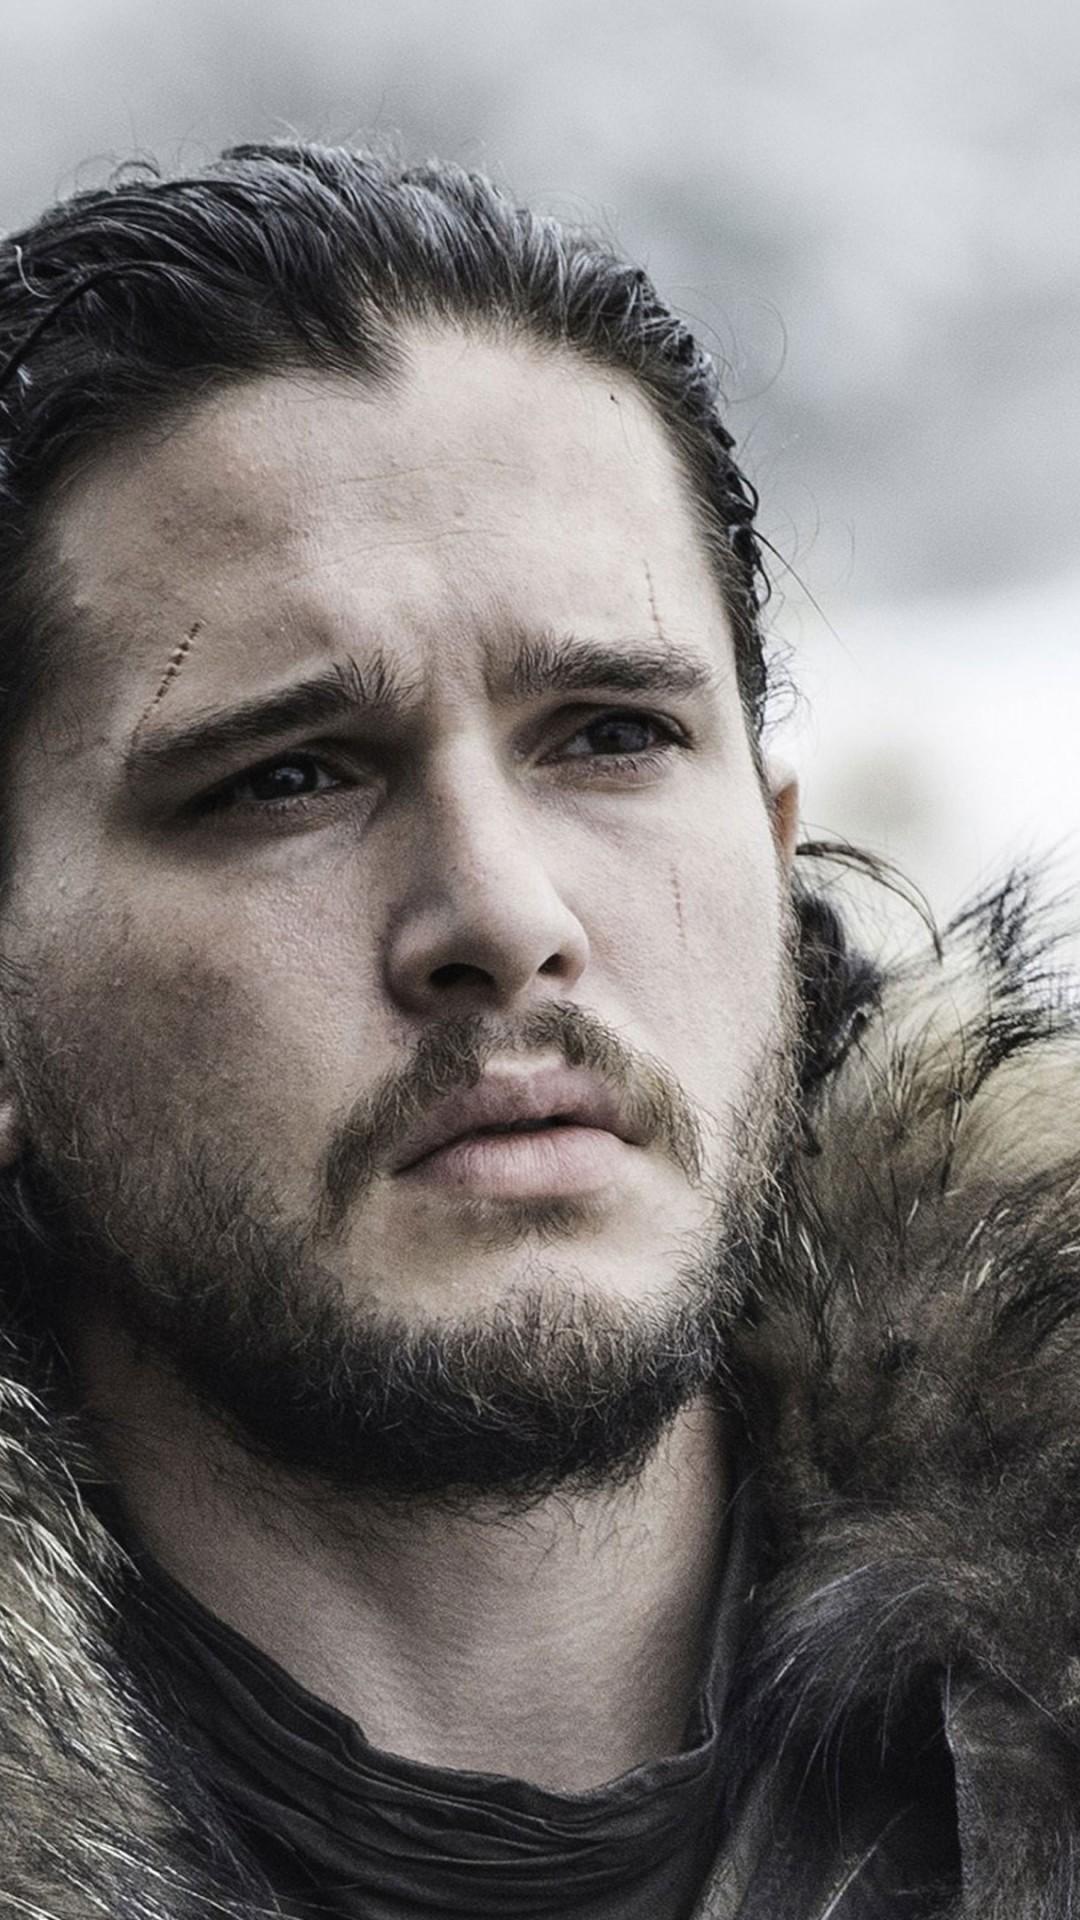 Hd Girls Of Game Of Thrones Wallpaper Wallpaper Game Of Thrones 6 Season Jon Snow Kit